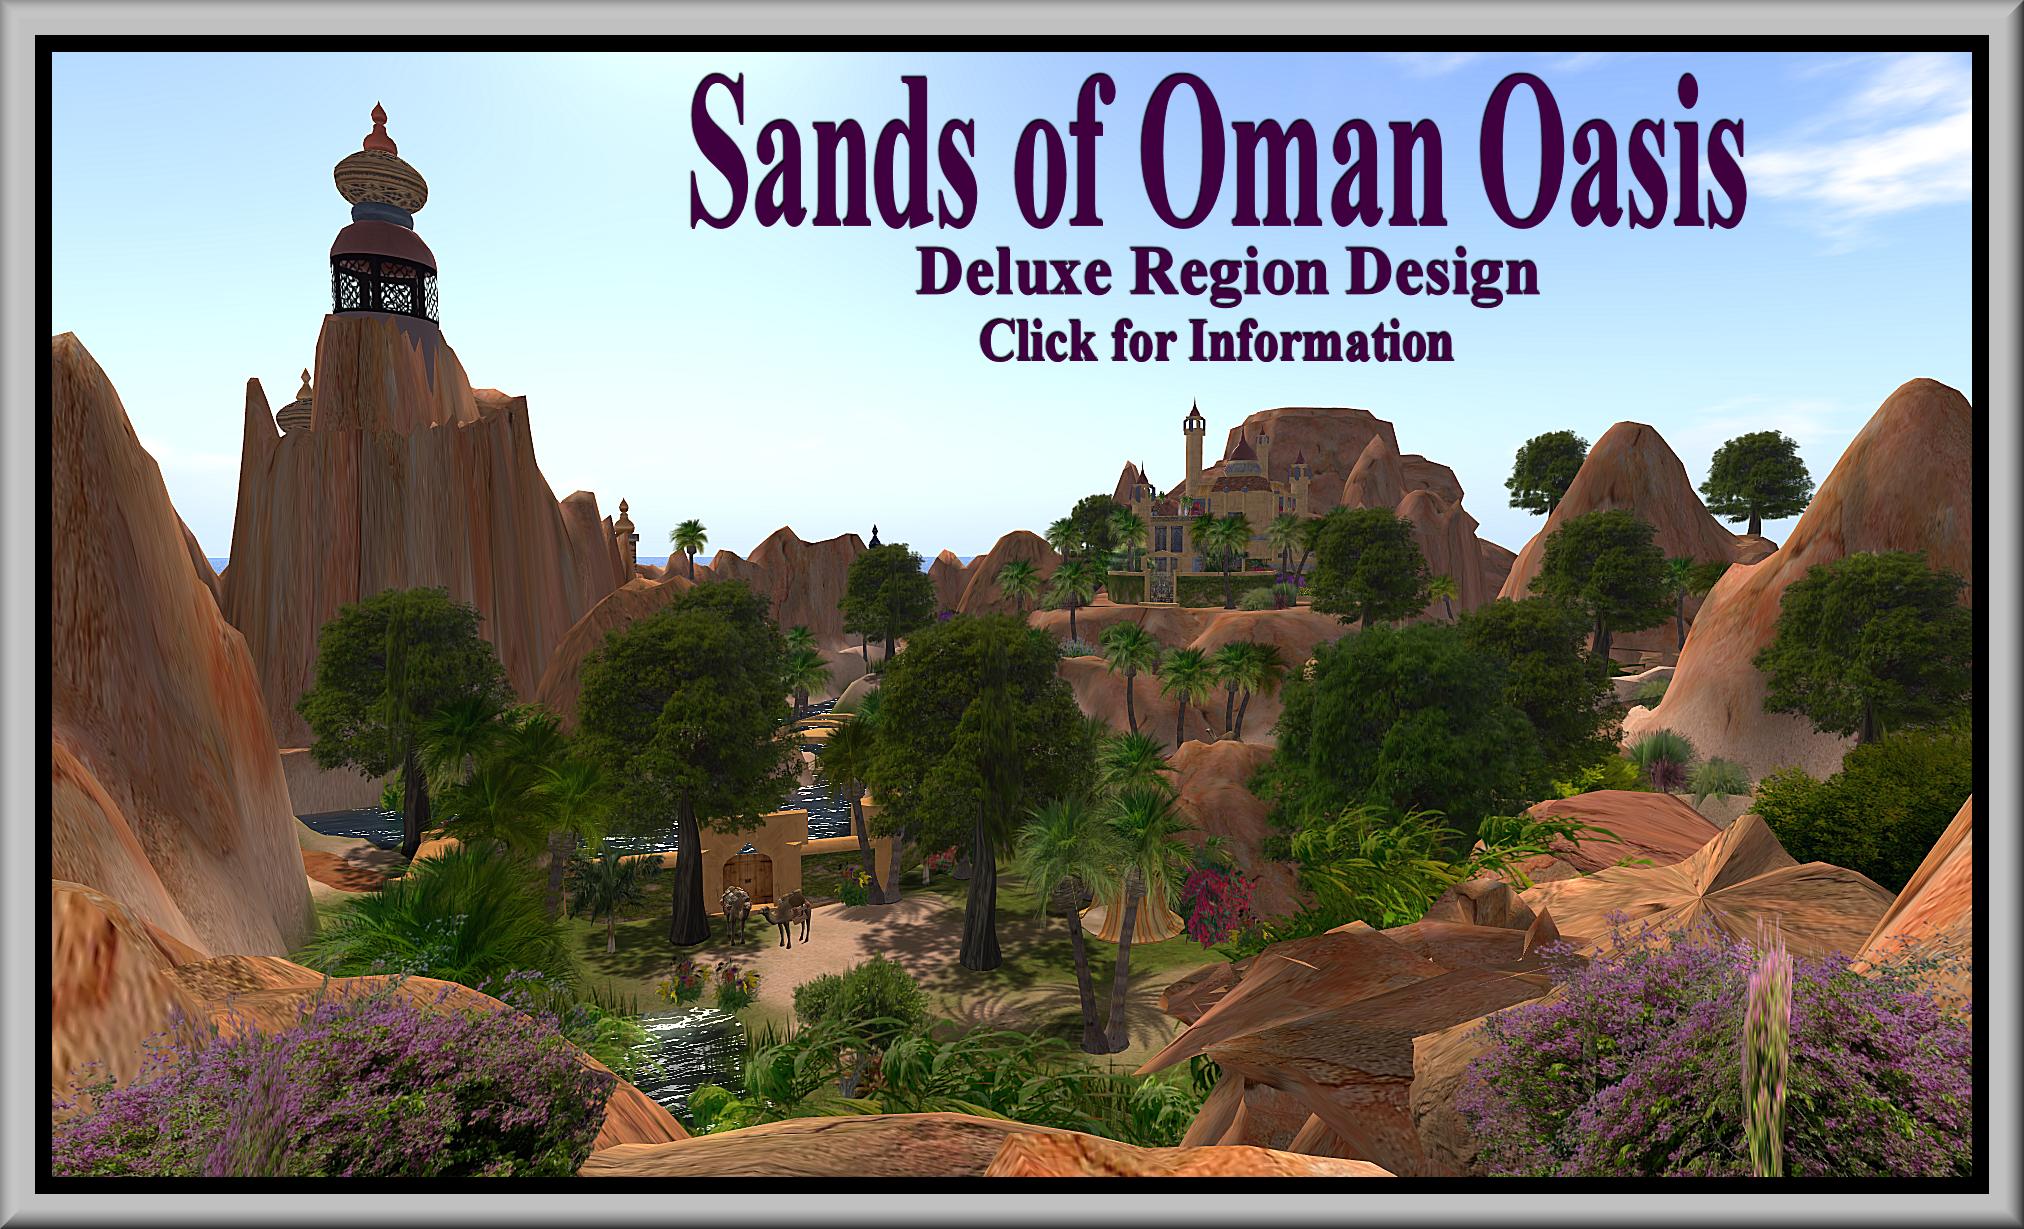 Sands of Oman Oasis.png